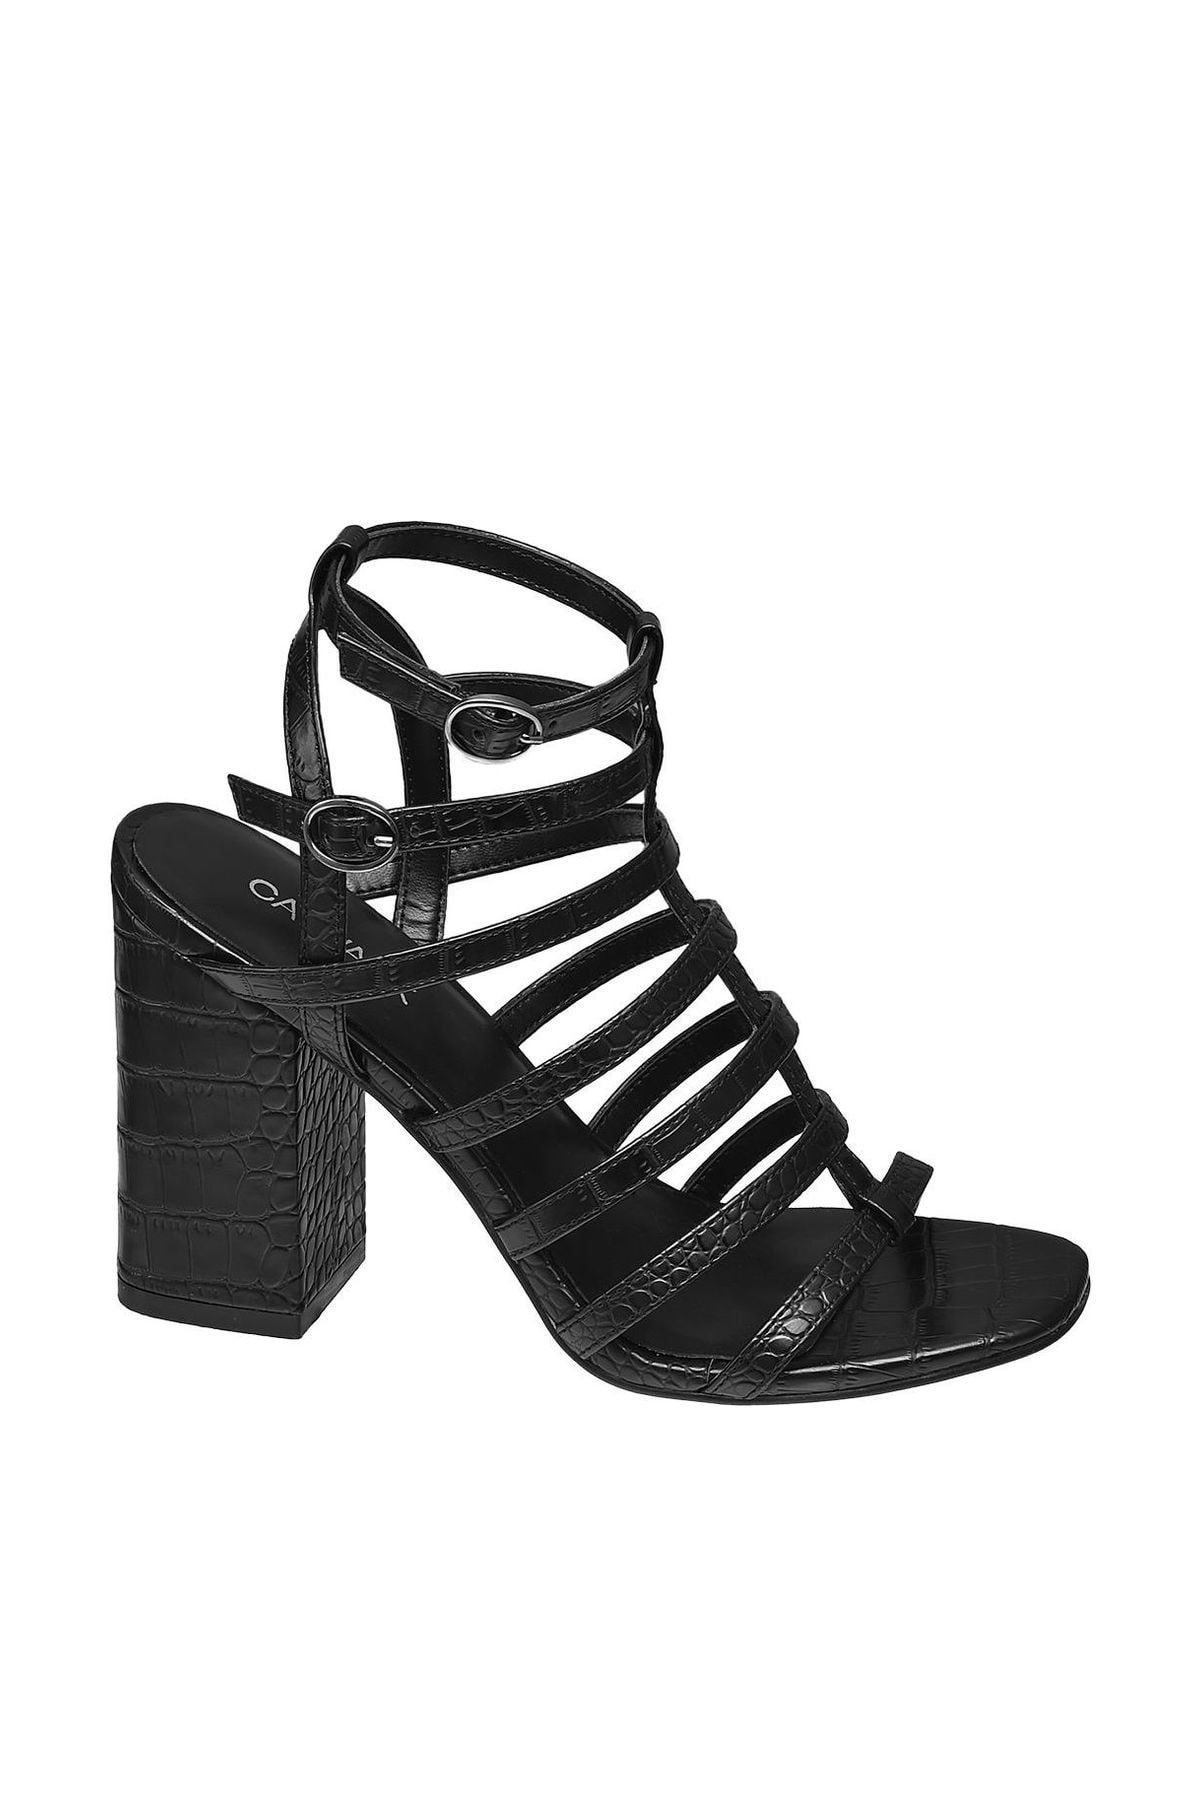 Deichmann Siyah Topuklu Sandalet